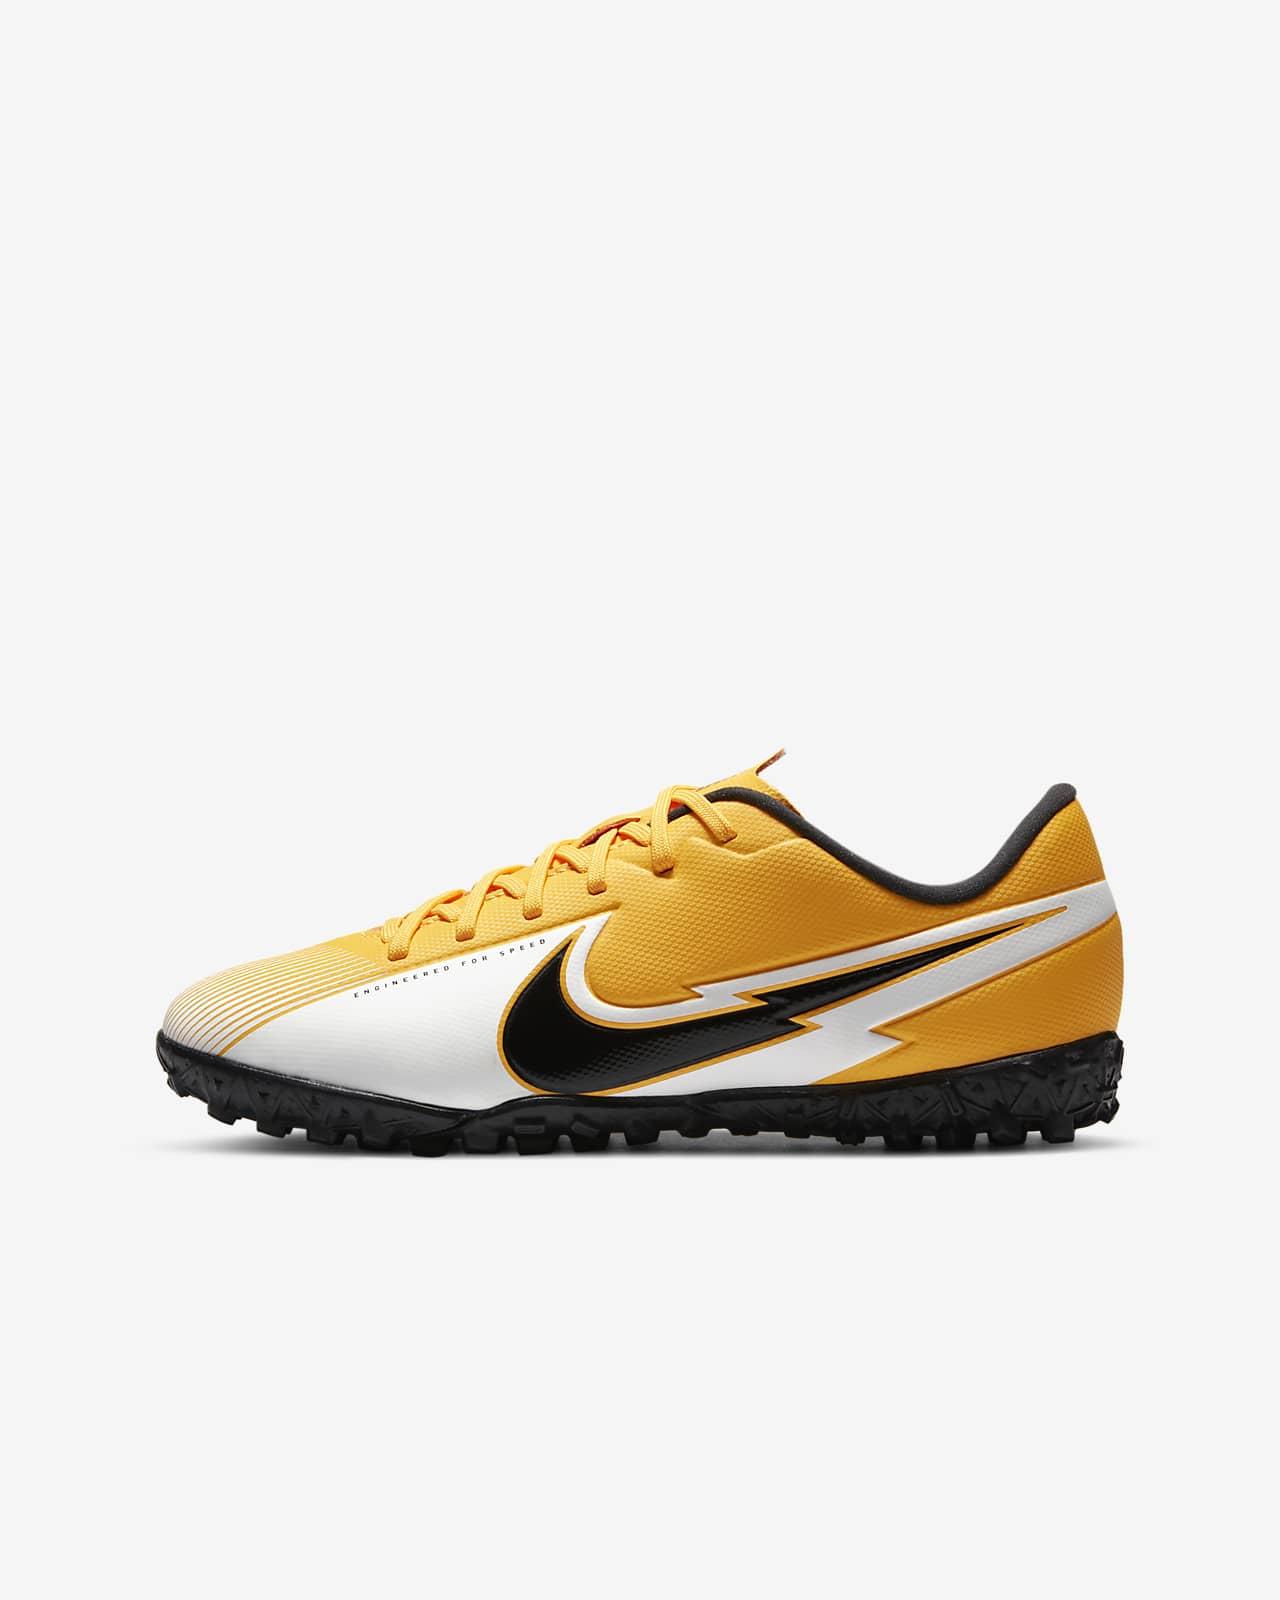 Nike Jr. Mercurial Vapor 13 Academy TF Younger/Older Kids' Artificial-Turf Football Shoe